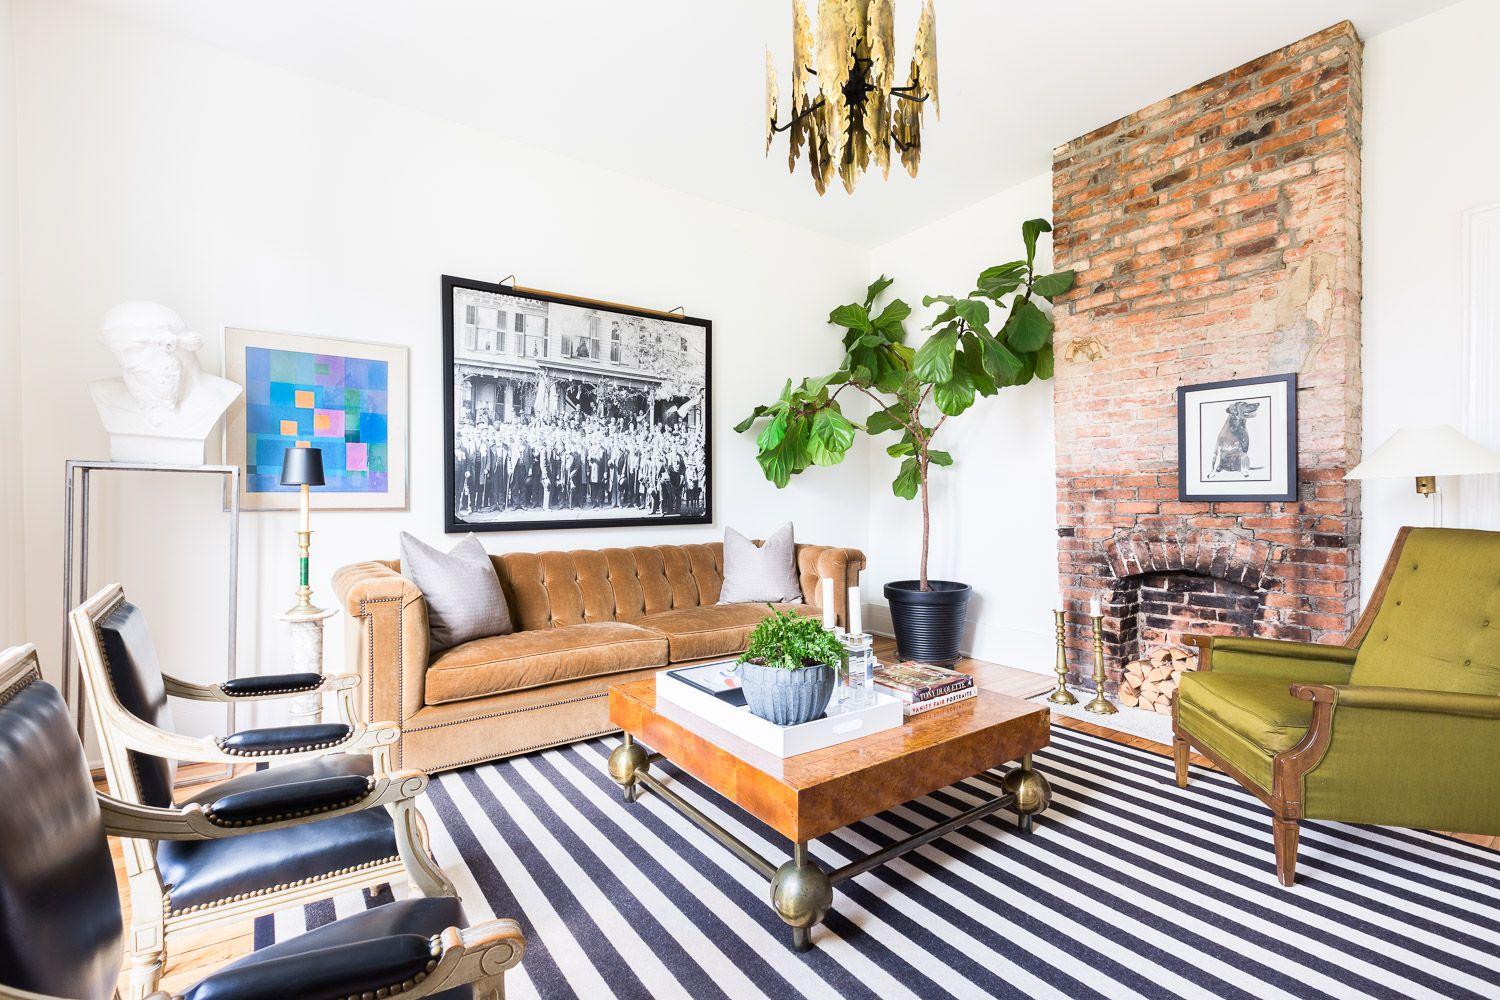 living room interior design 2016 decorating small open kitchen 56 lovely ideas best modern decor